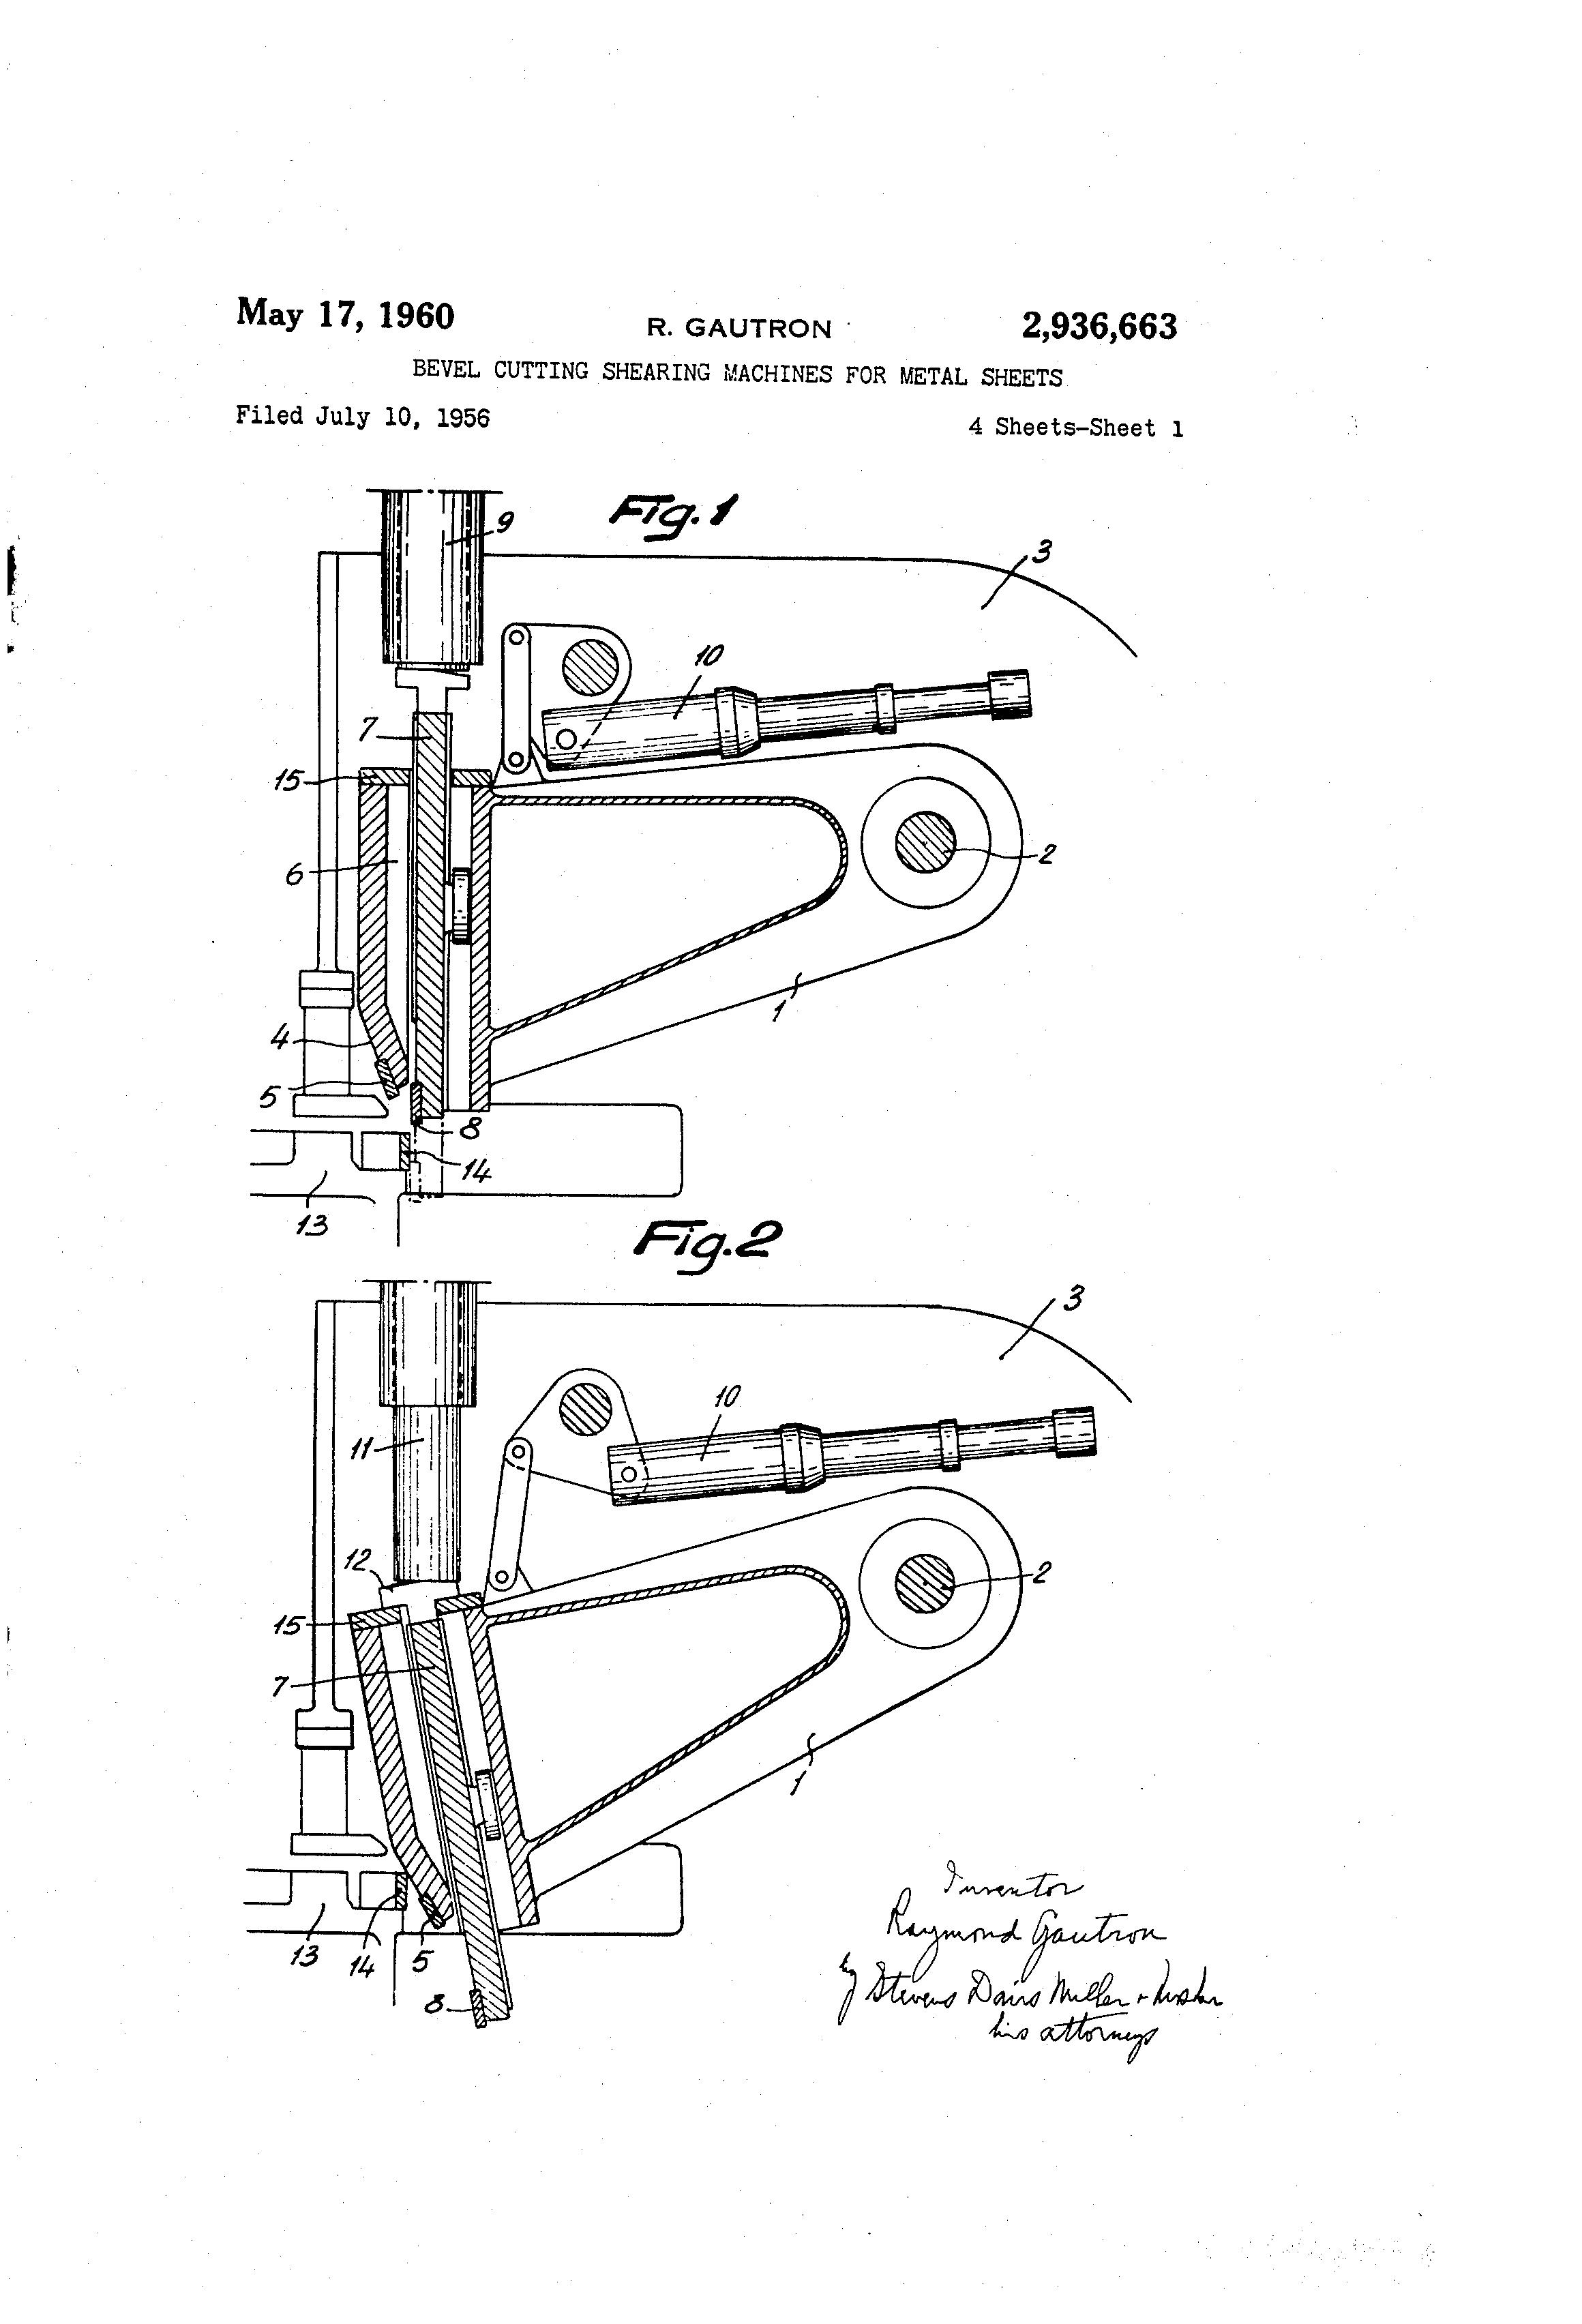 Patent US2936663 - Bevel cutting shearing machines for metal